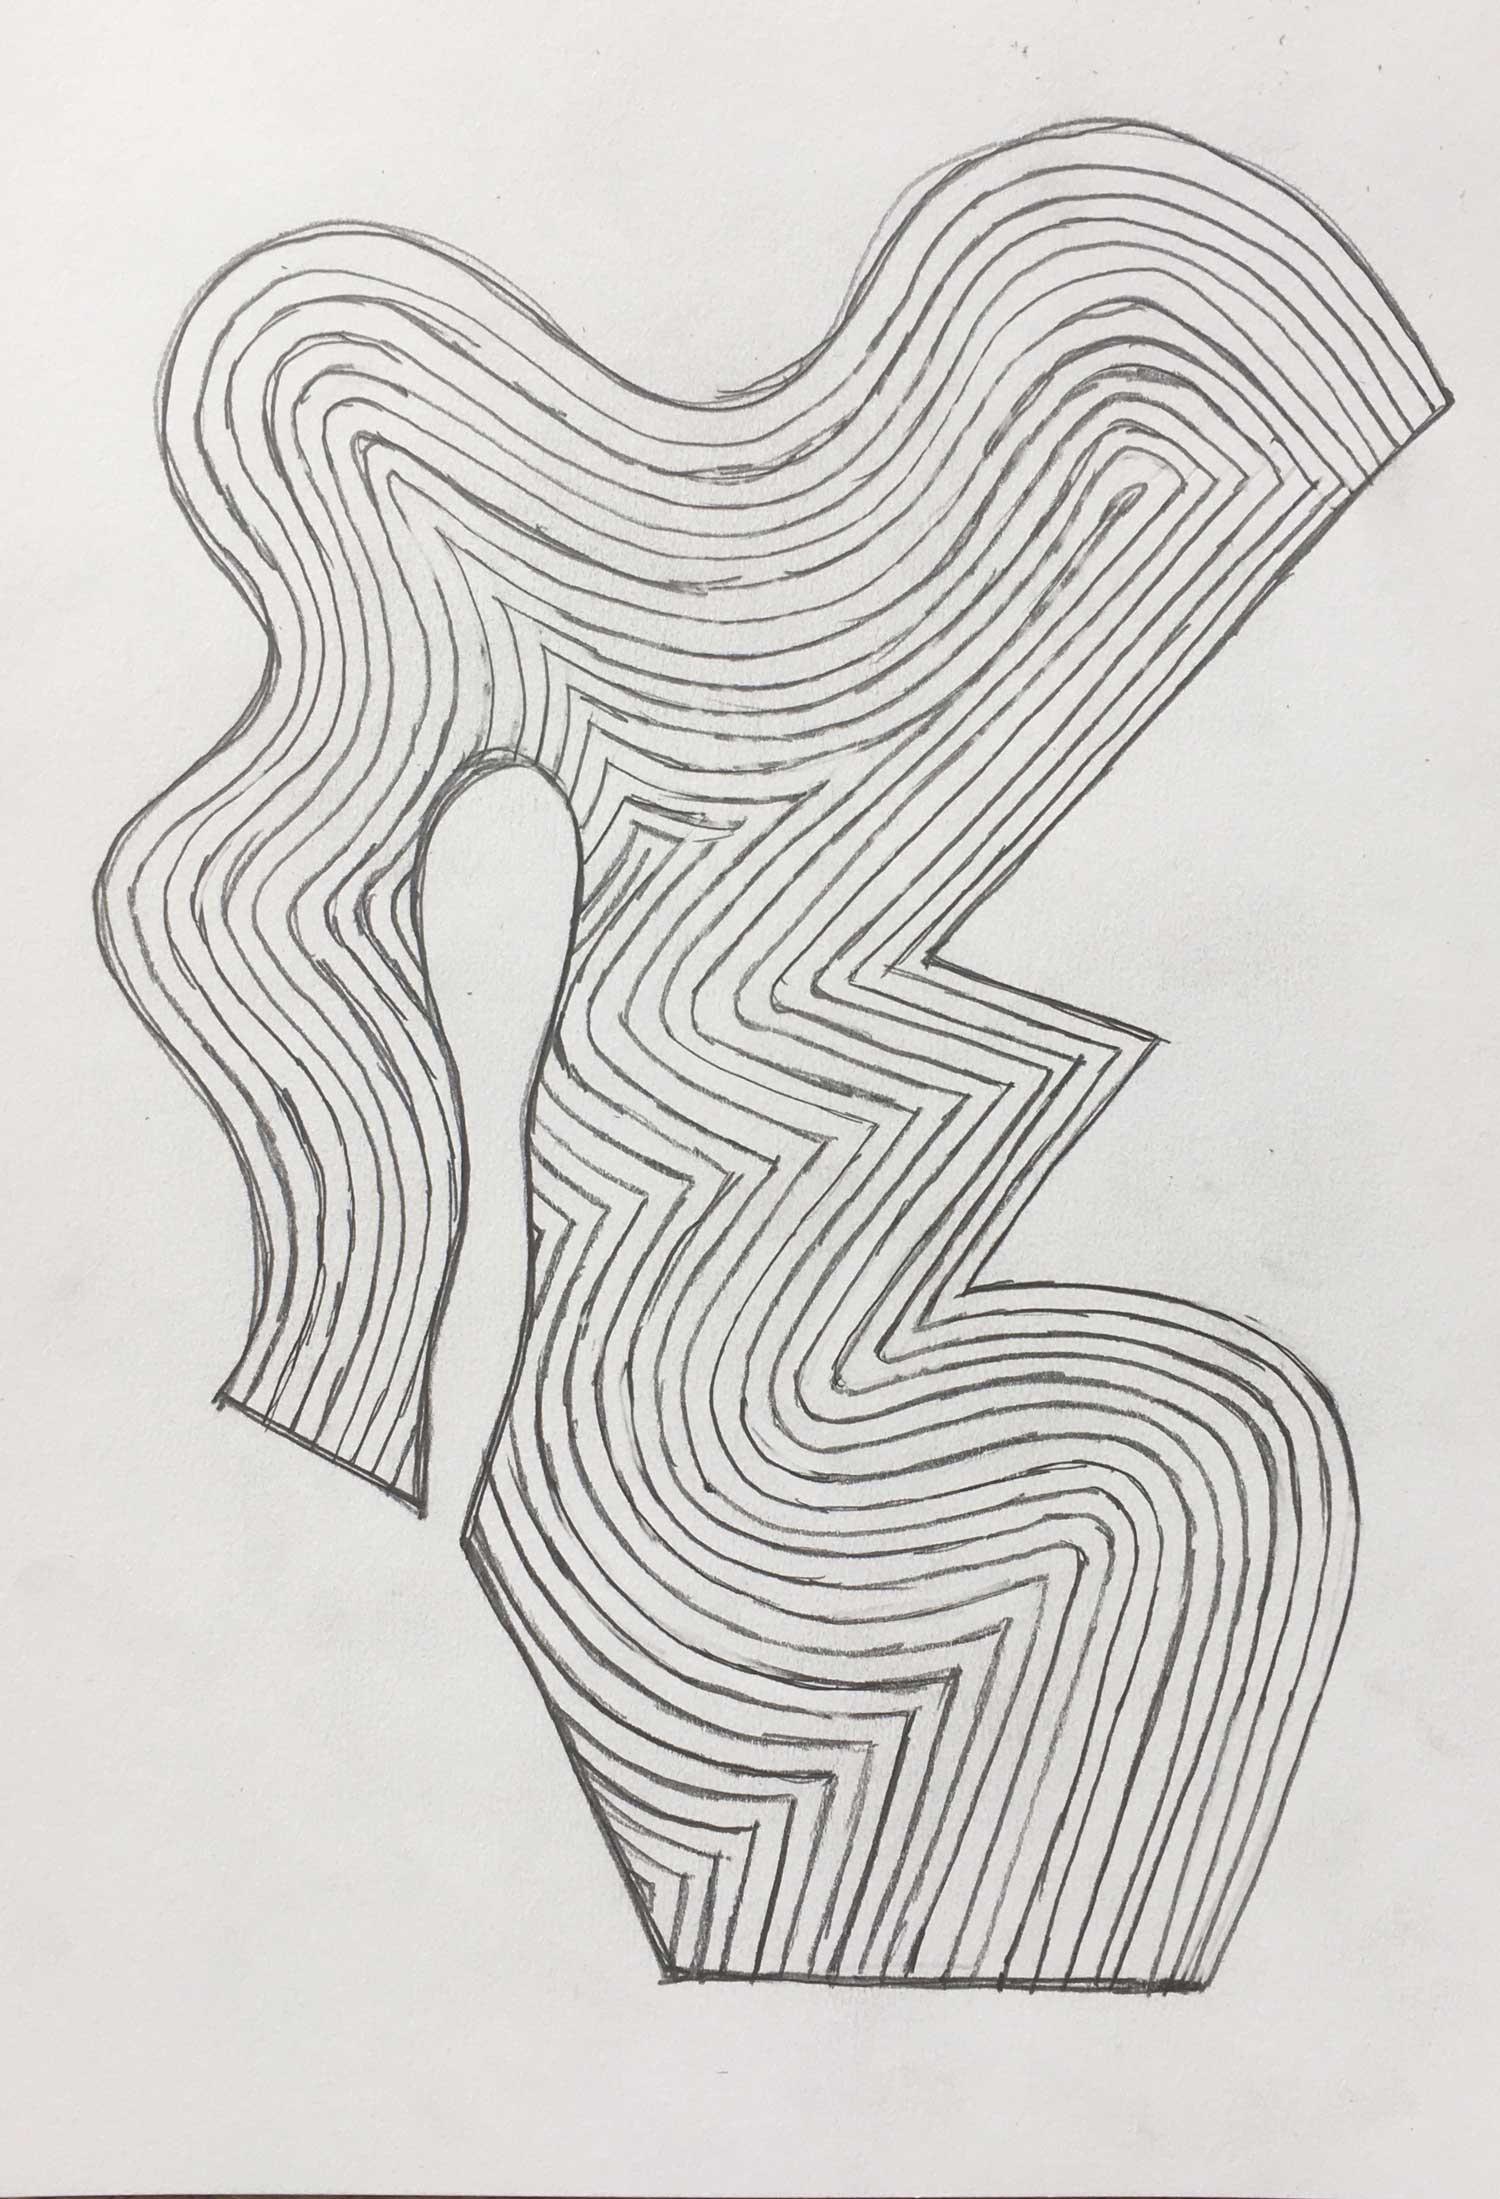 rebecca_bramwell_drawing-.jpg